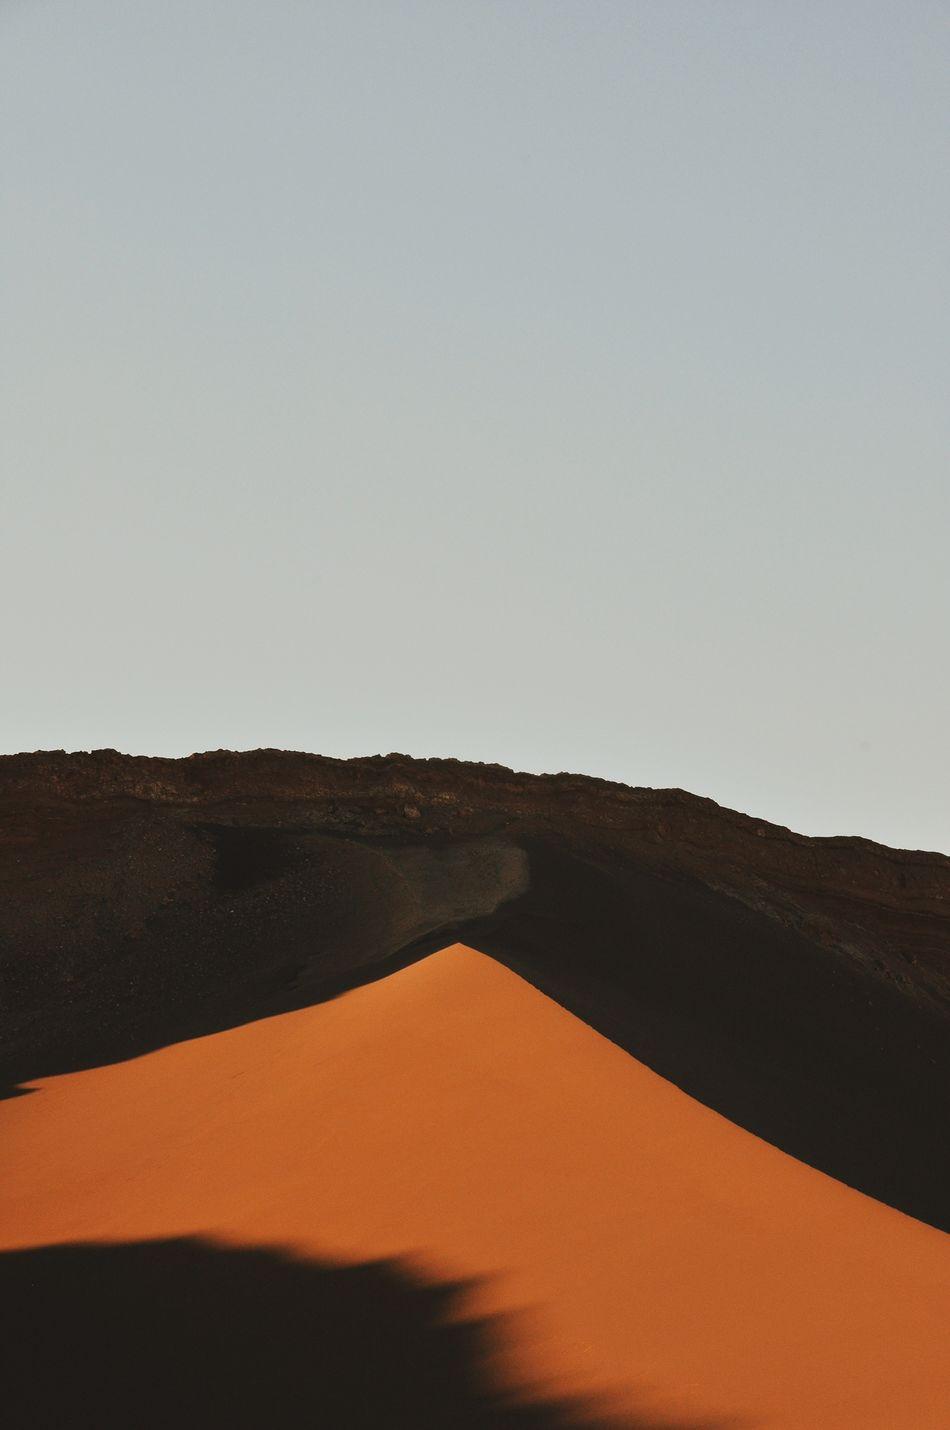 Beautiful stock photos of orange, Grey, Orange, Pastel, Vertical Image